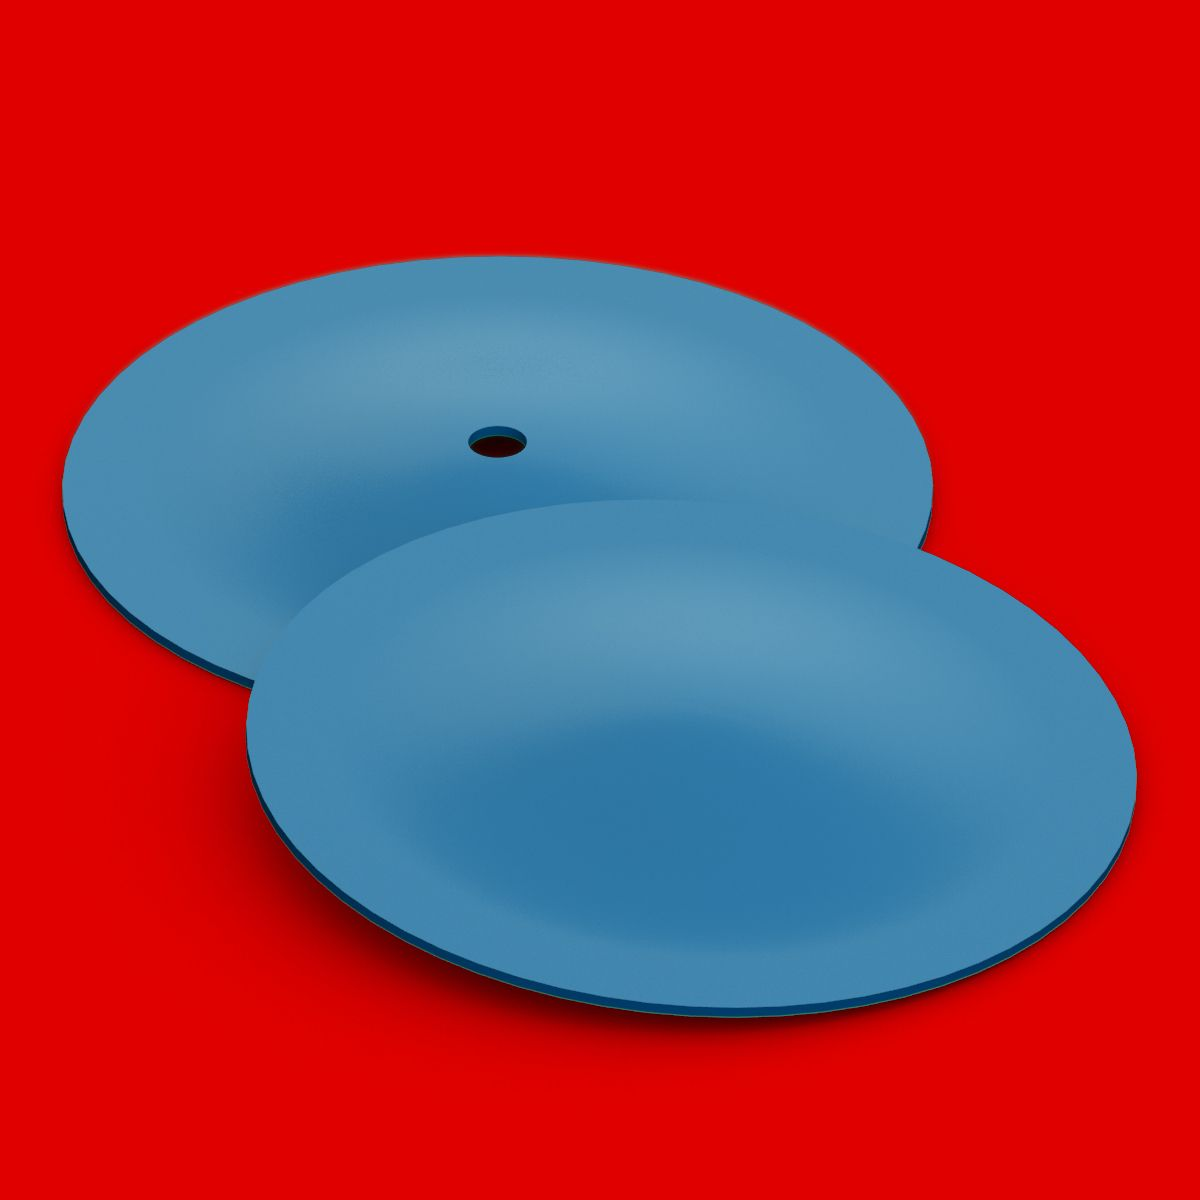 TFC Schleuderguss HTV Silikon Scheibenset HB 580C 400x10mm blau